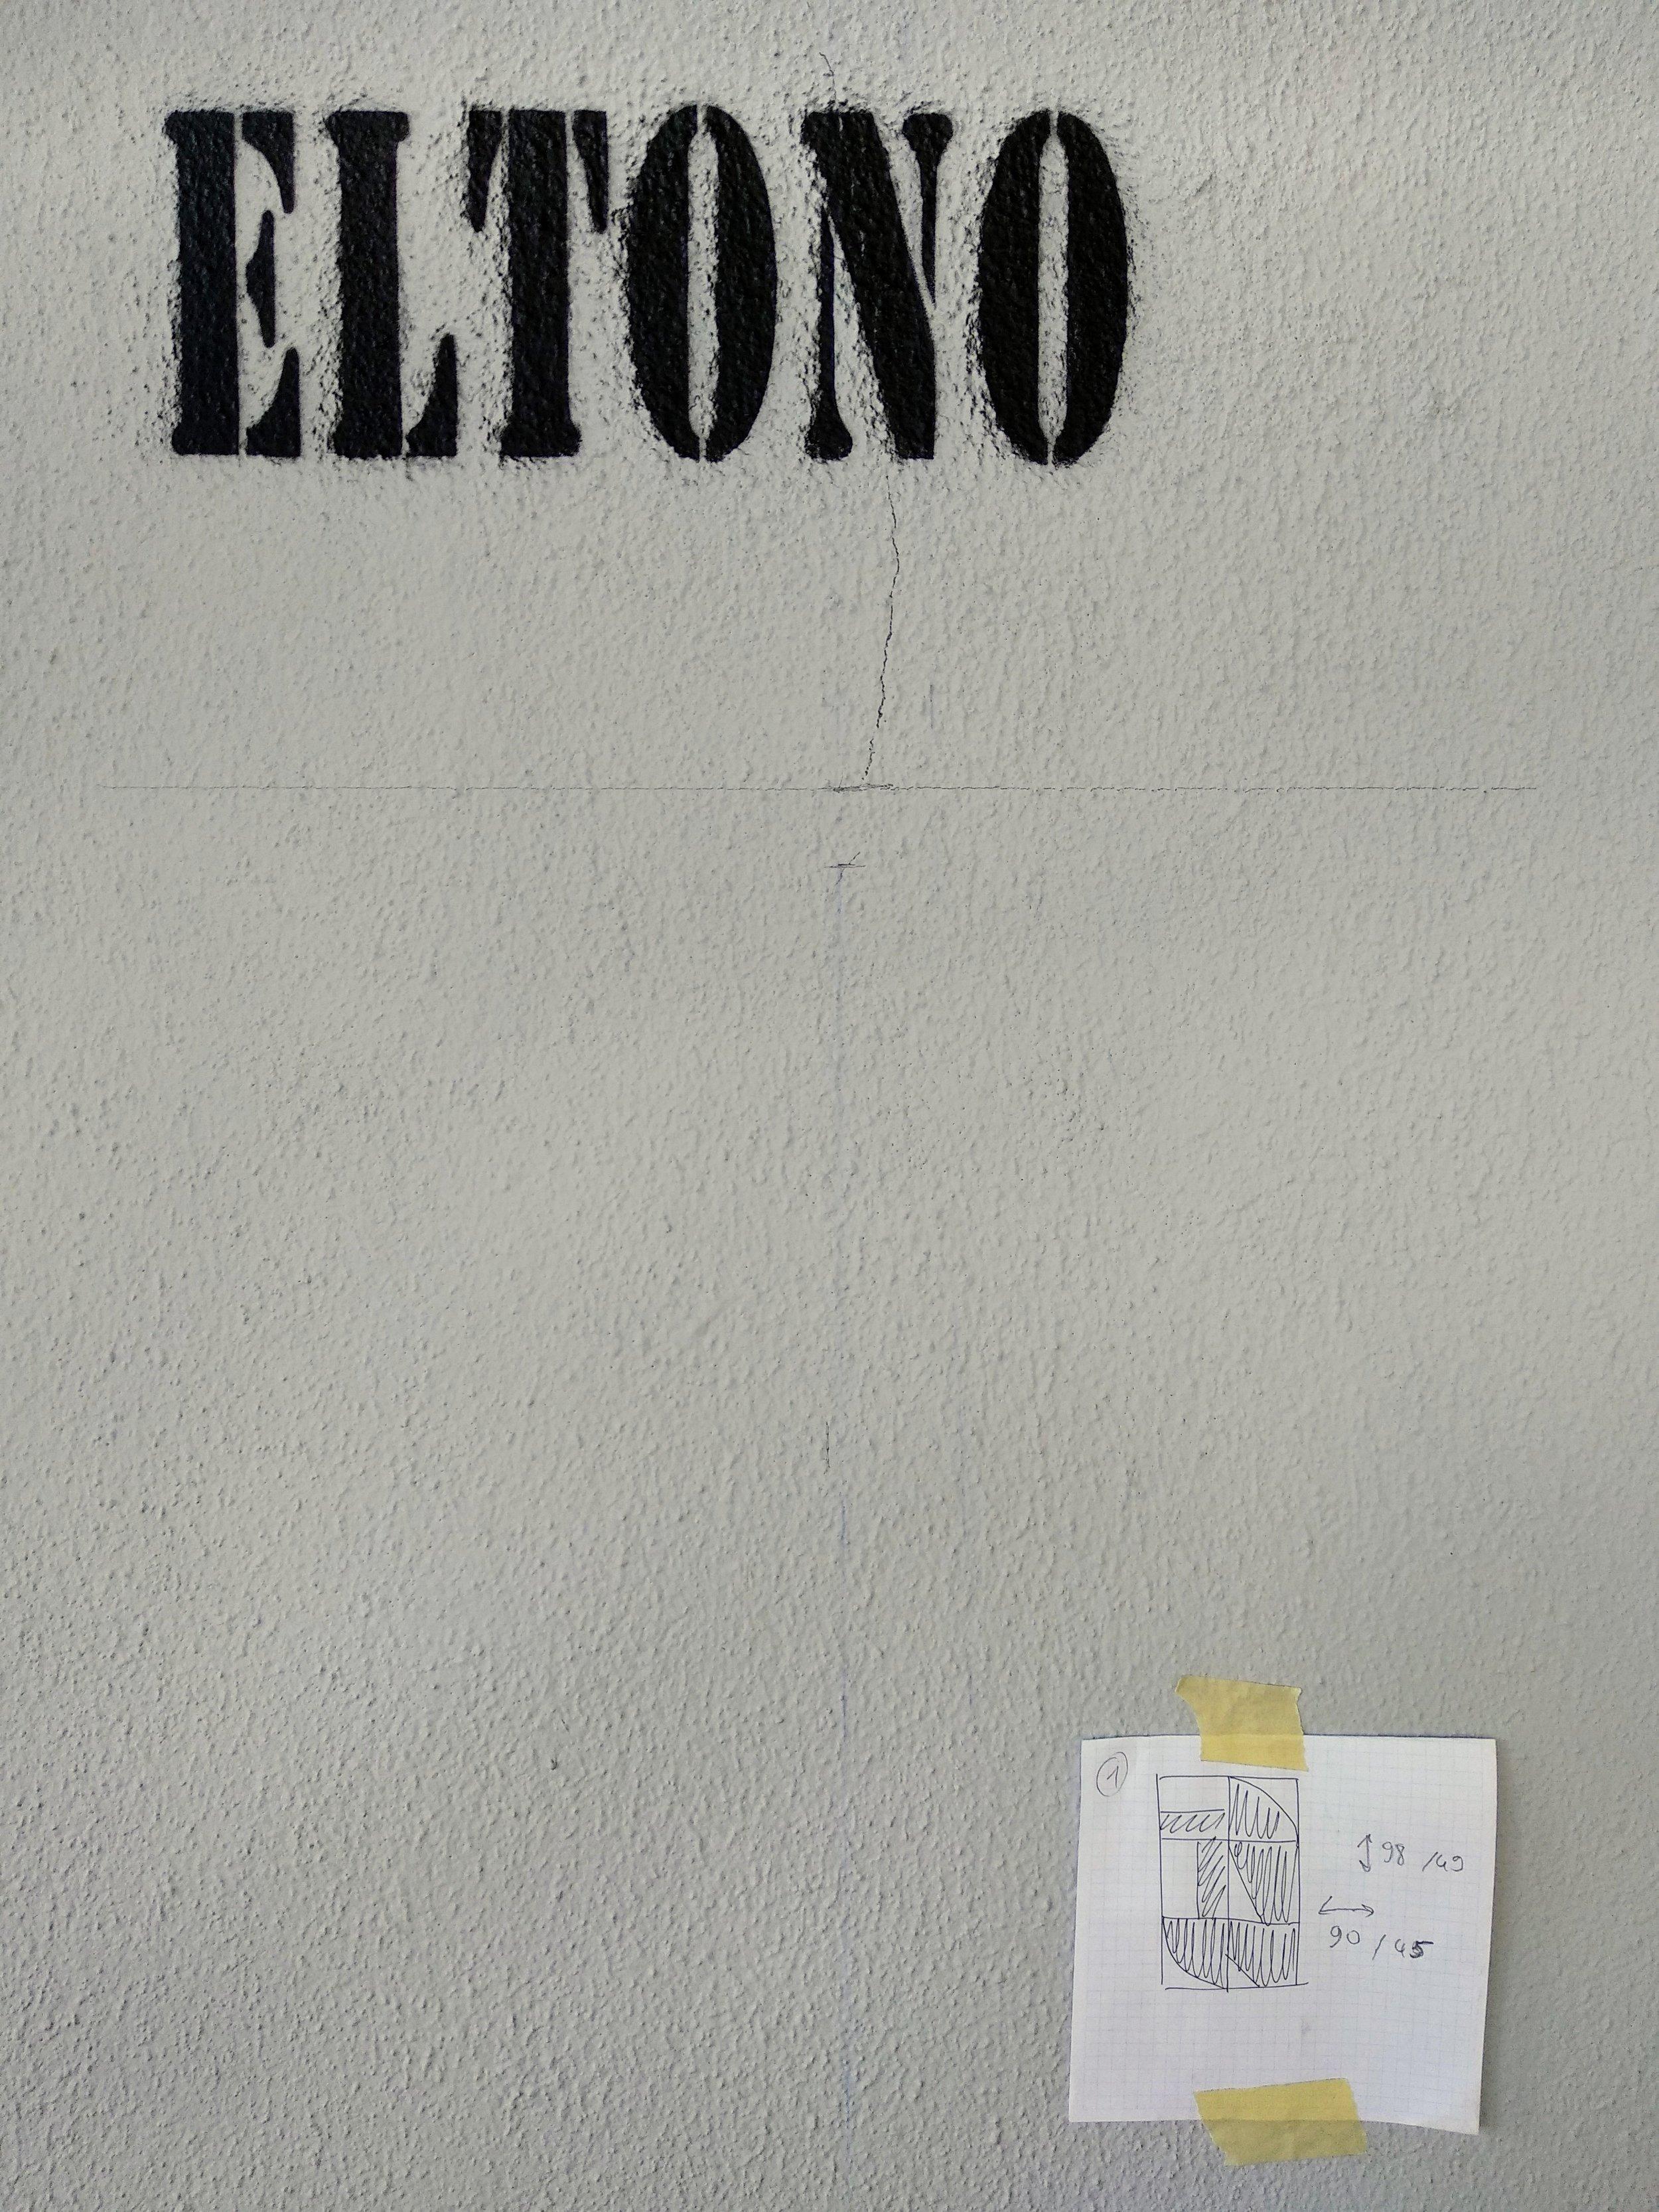 Eltono - Muros Tabacalera 2019 2.jpg